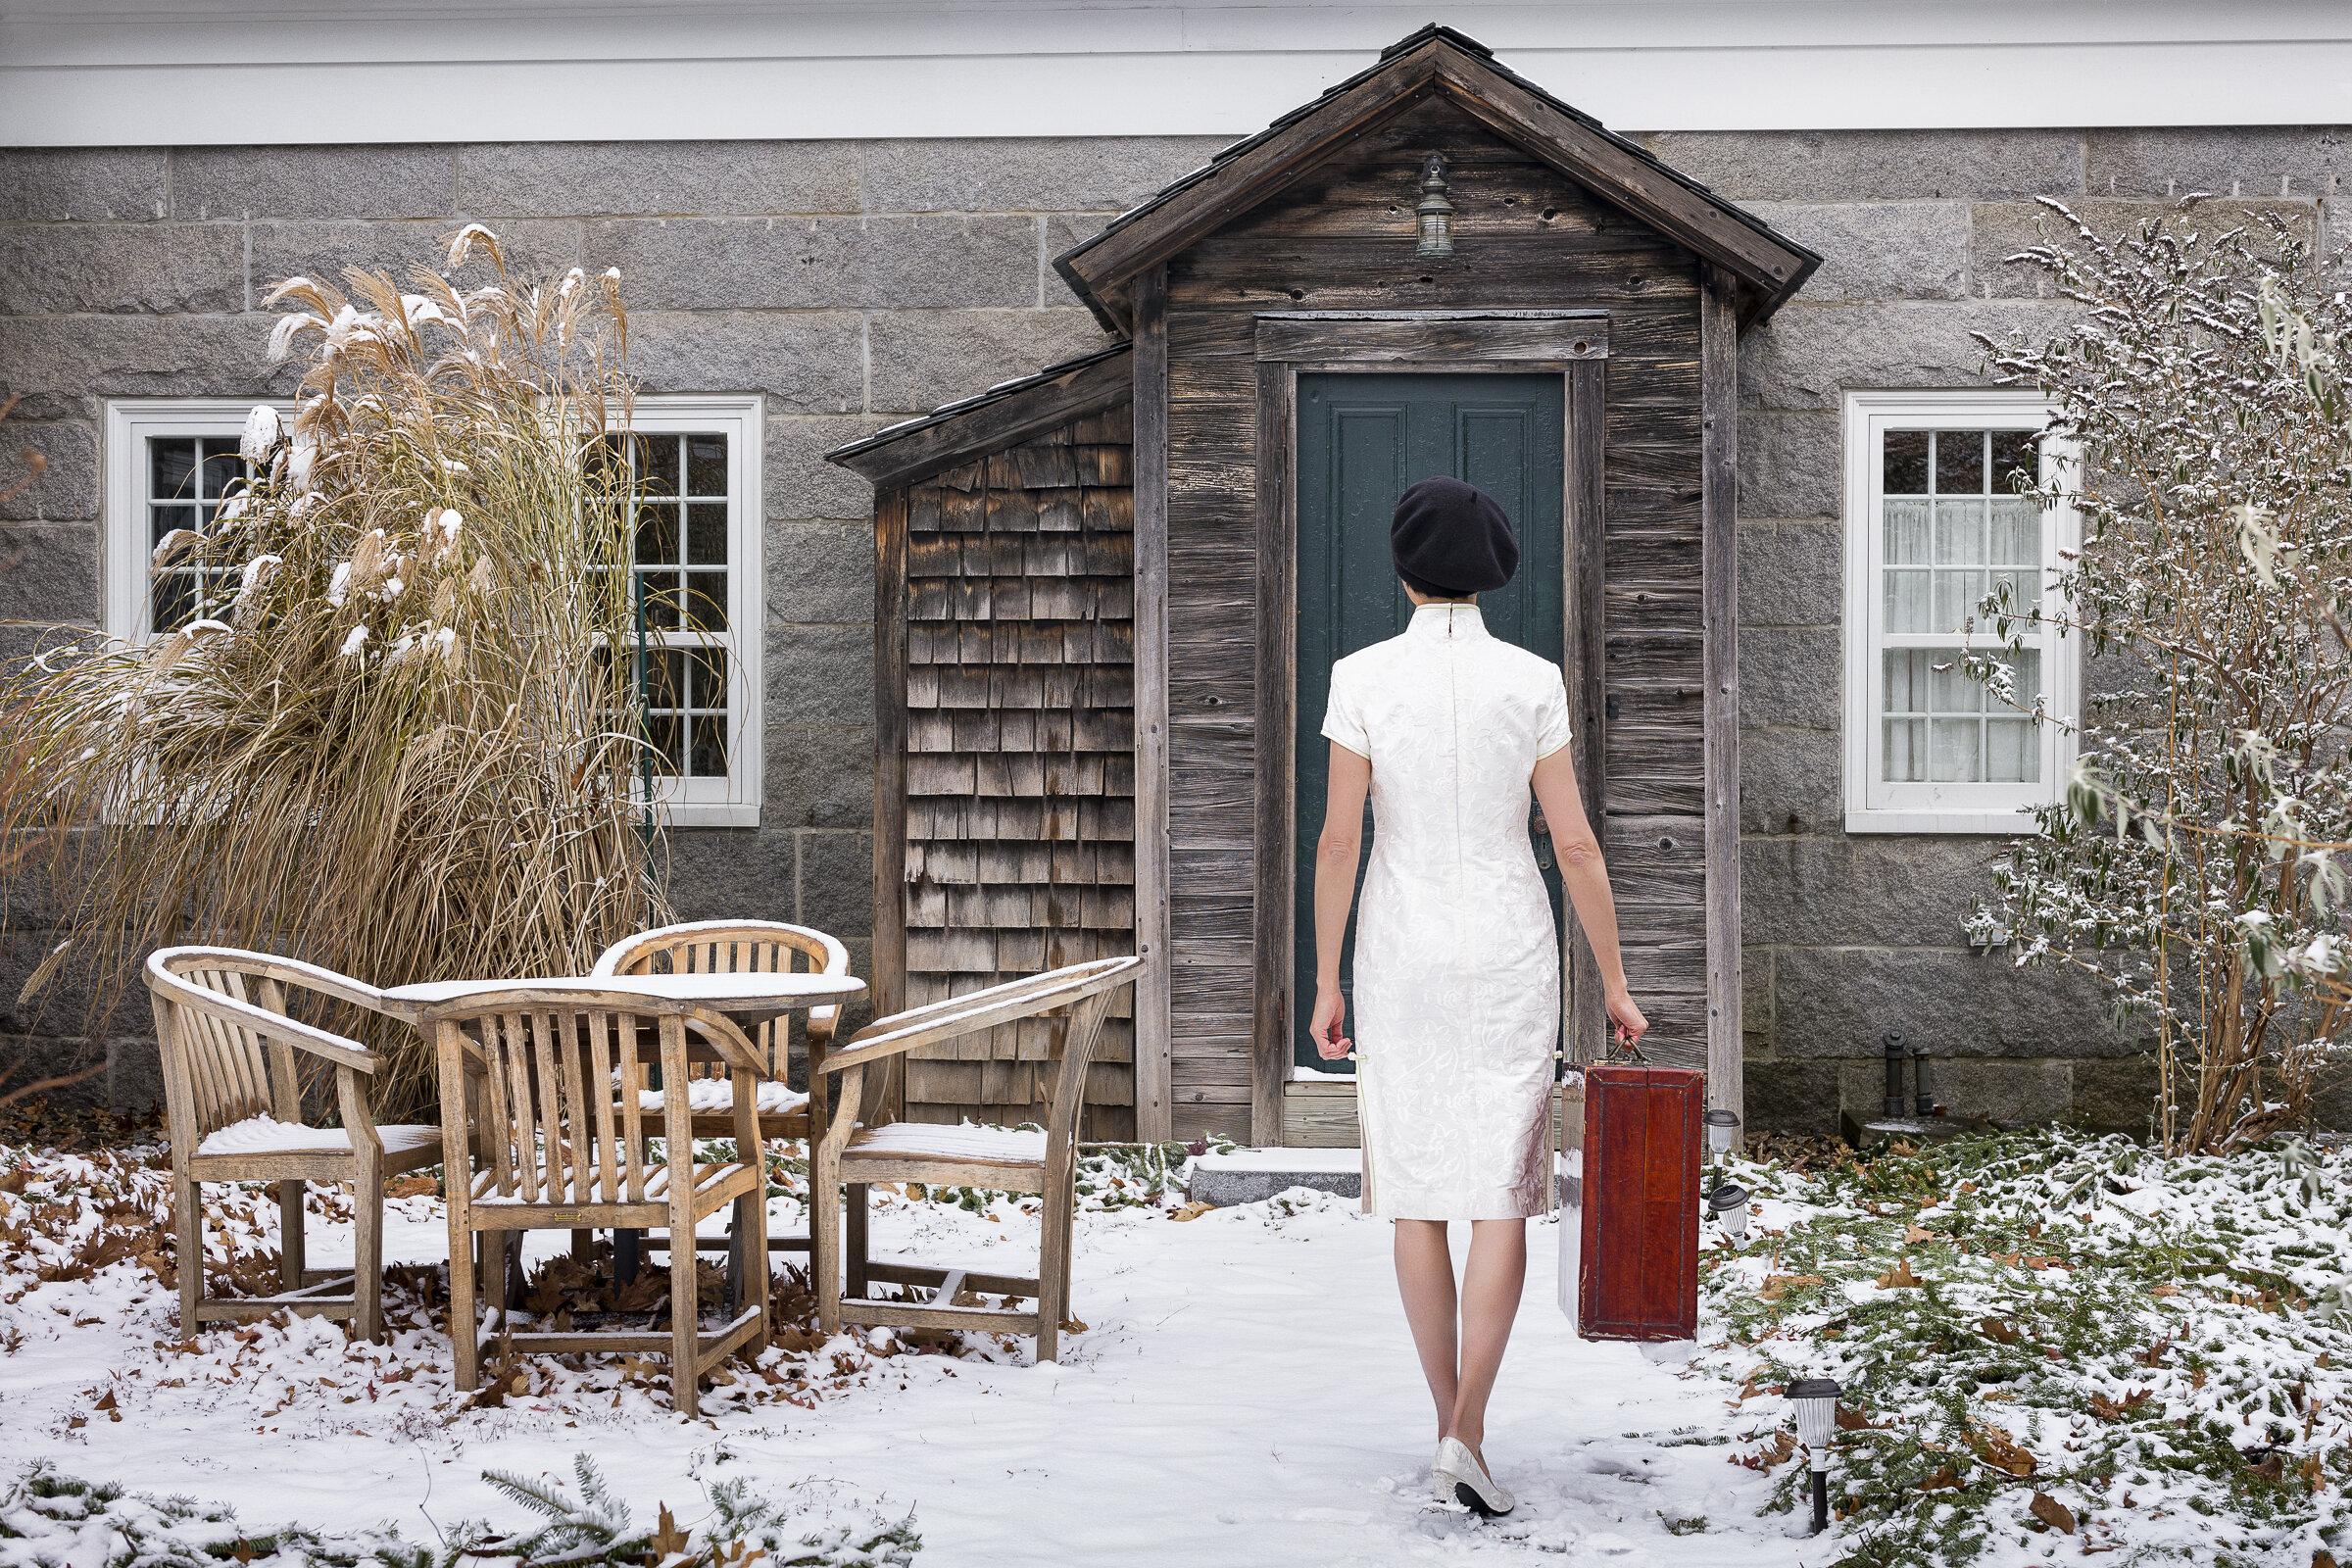 In America-Winter #7